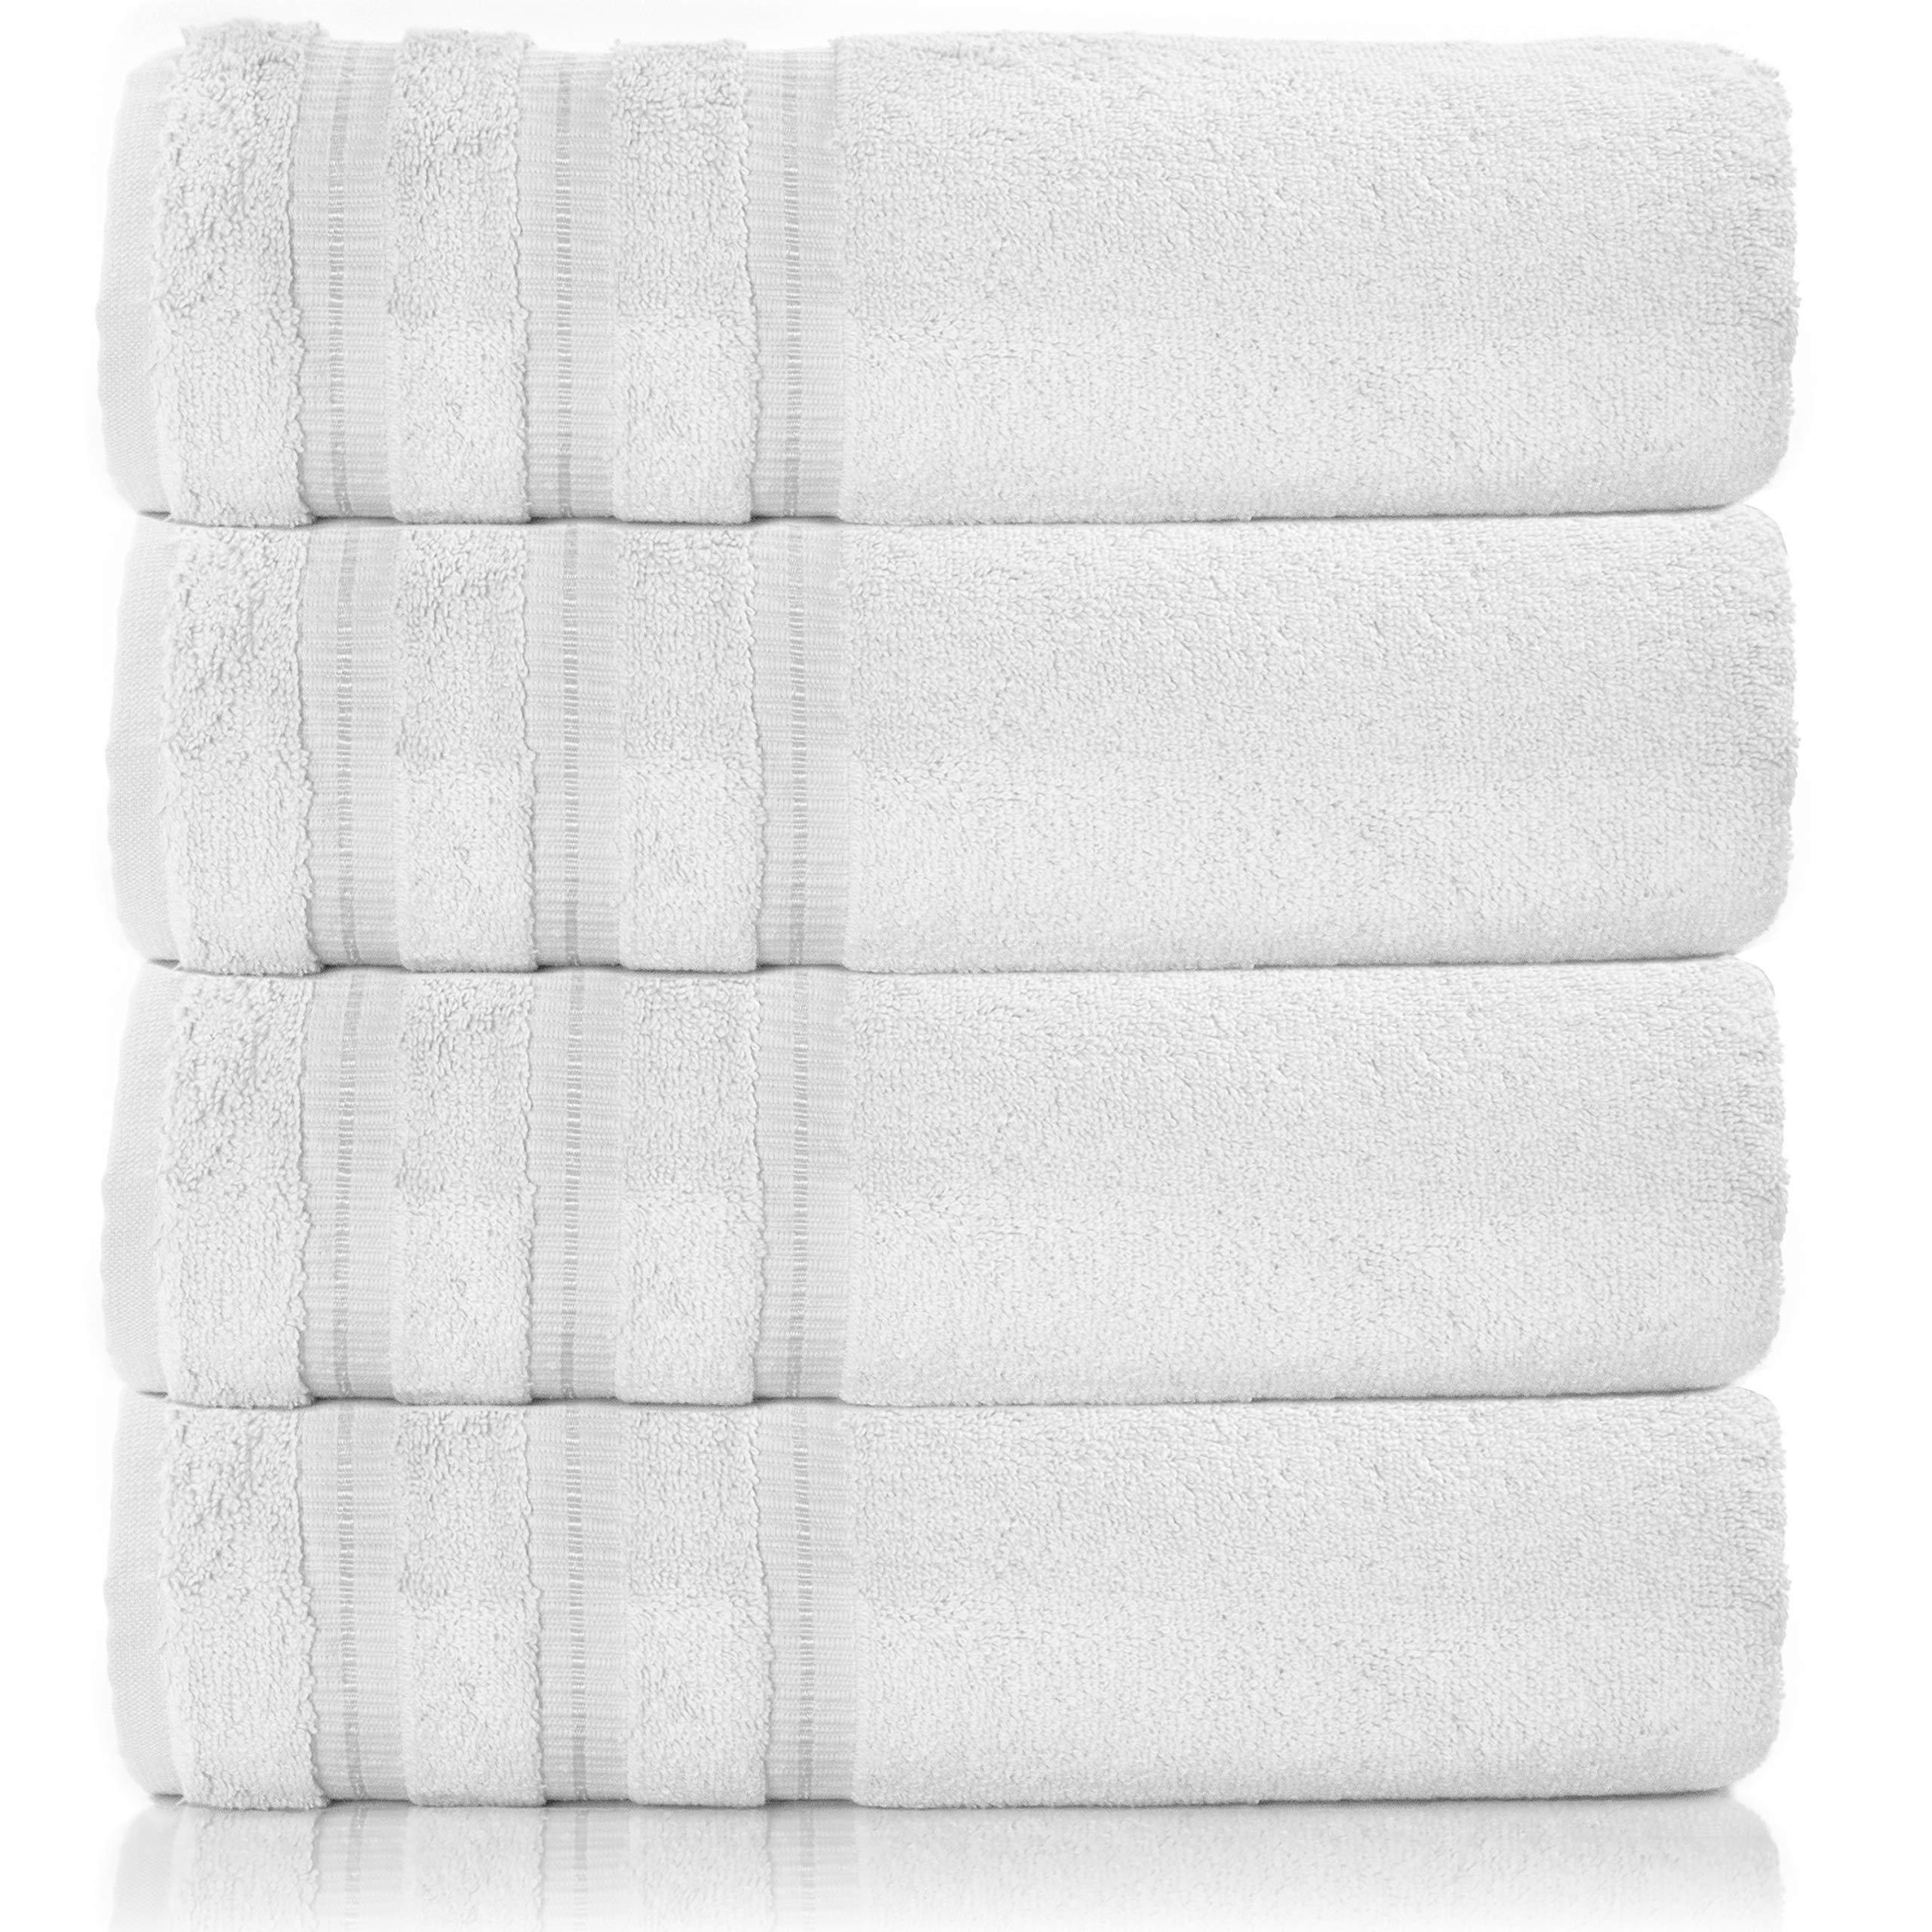 Silken Textile   Premium Towel Set 100% Turkish Cotton   4 Pieces Bath Sets Towel for Hotel Bathroom Bridal Registry Dorm Home Essentials (White)